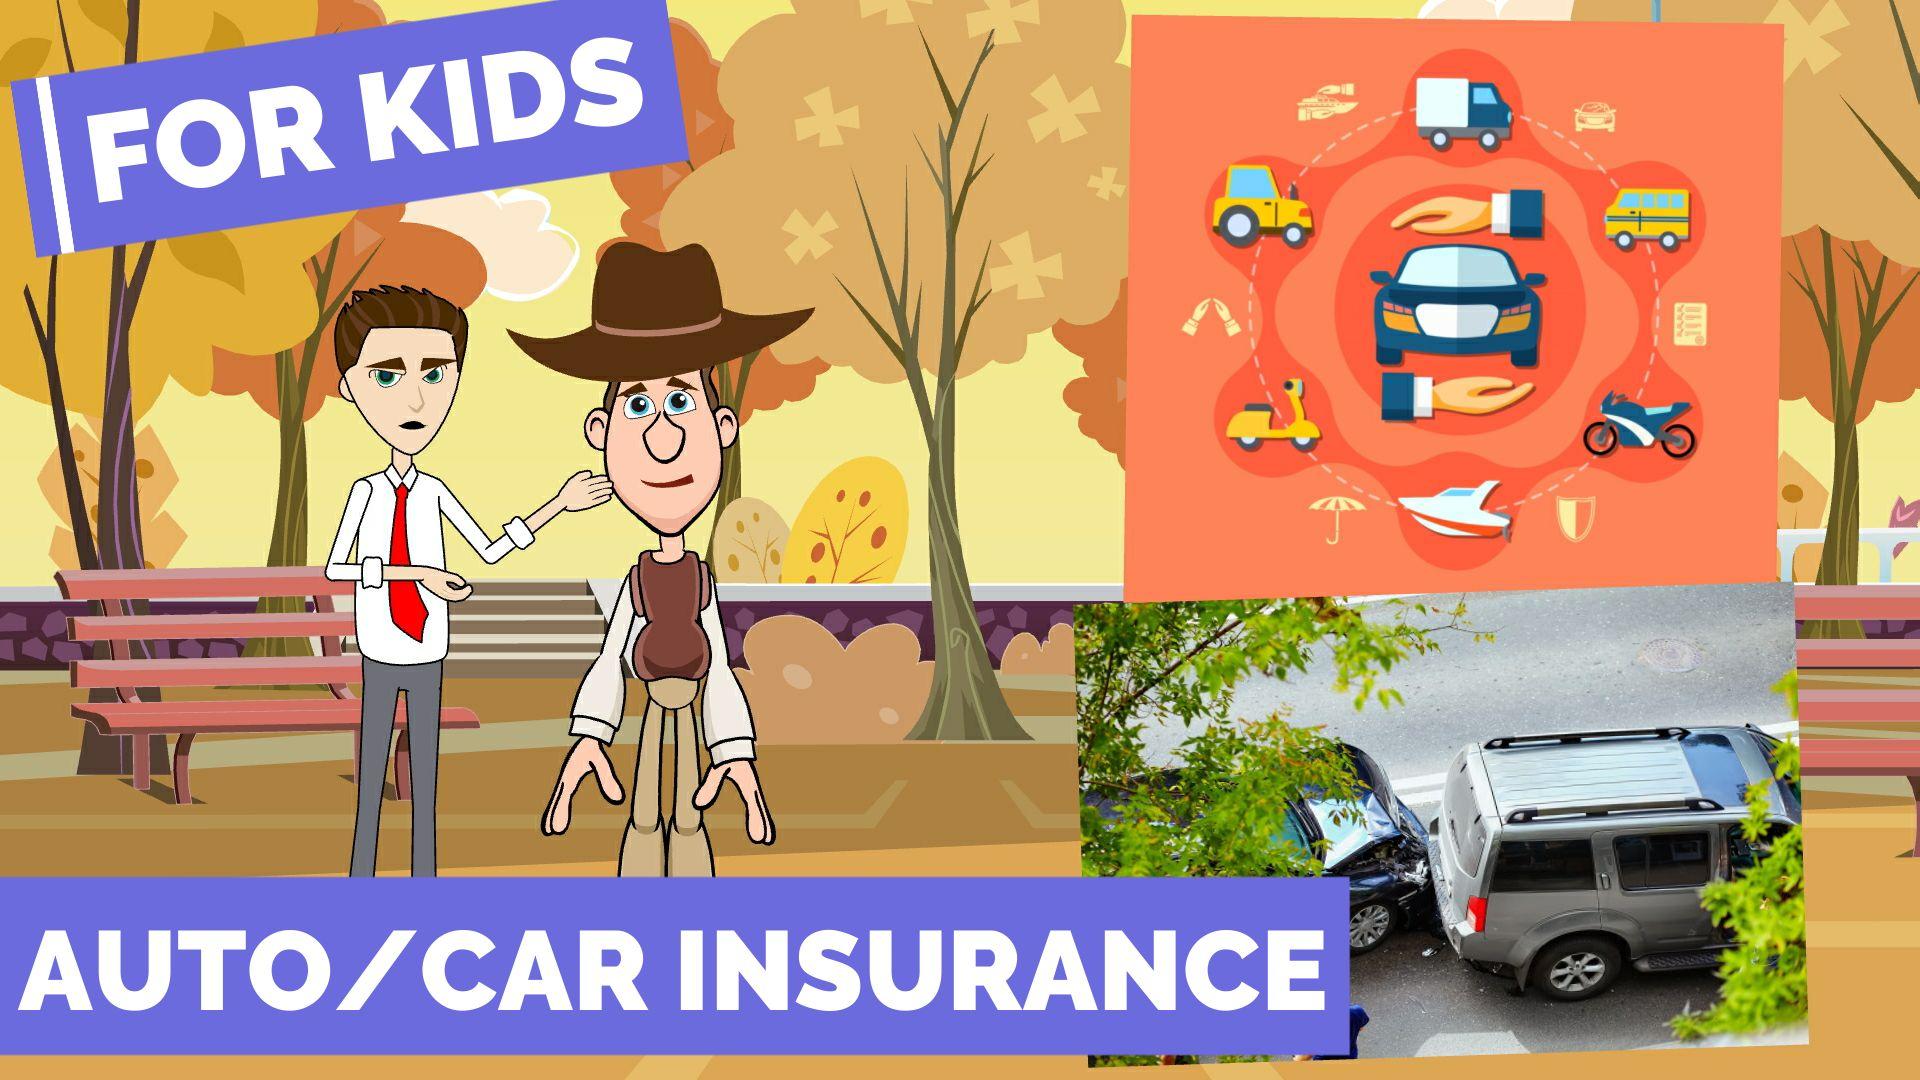 Auto Insurance Car Insurance Motor Vehicle